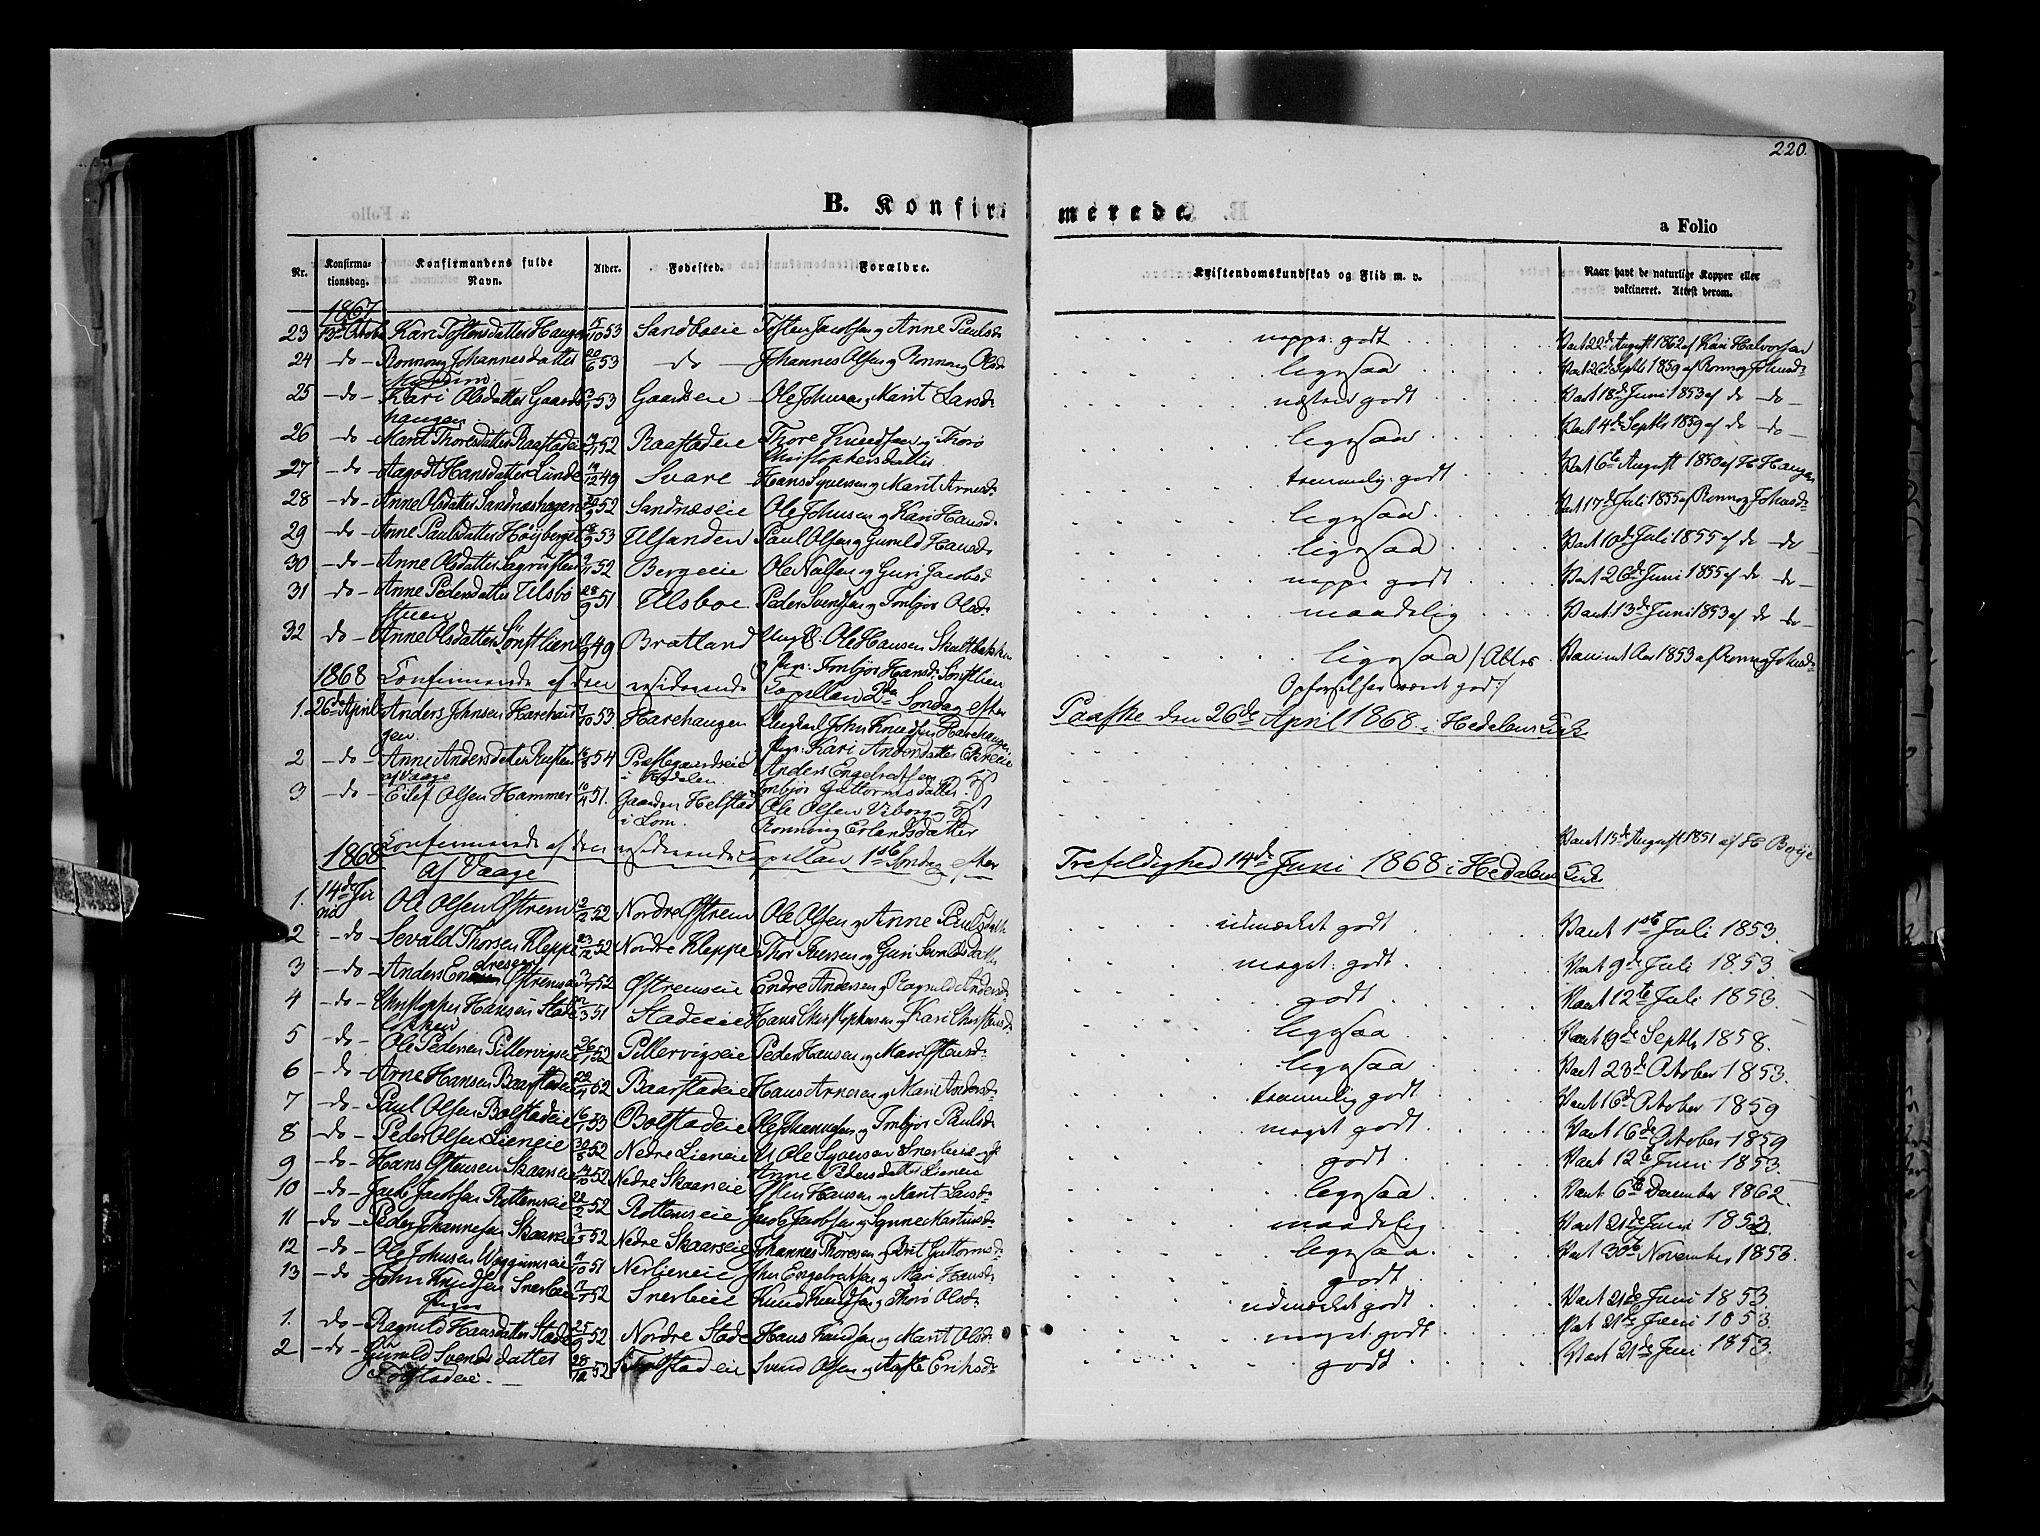 SAH, Vågå prestekontor, Ministerialbok nr. 6 /1, 1856-1872, s. 220